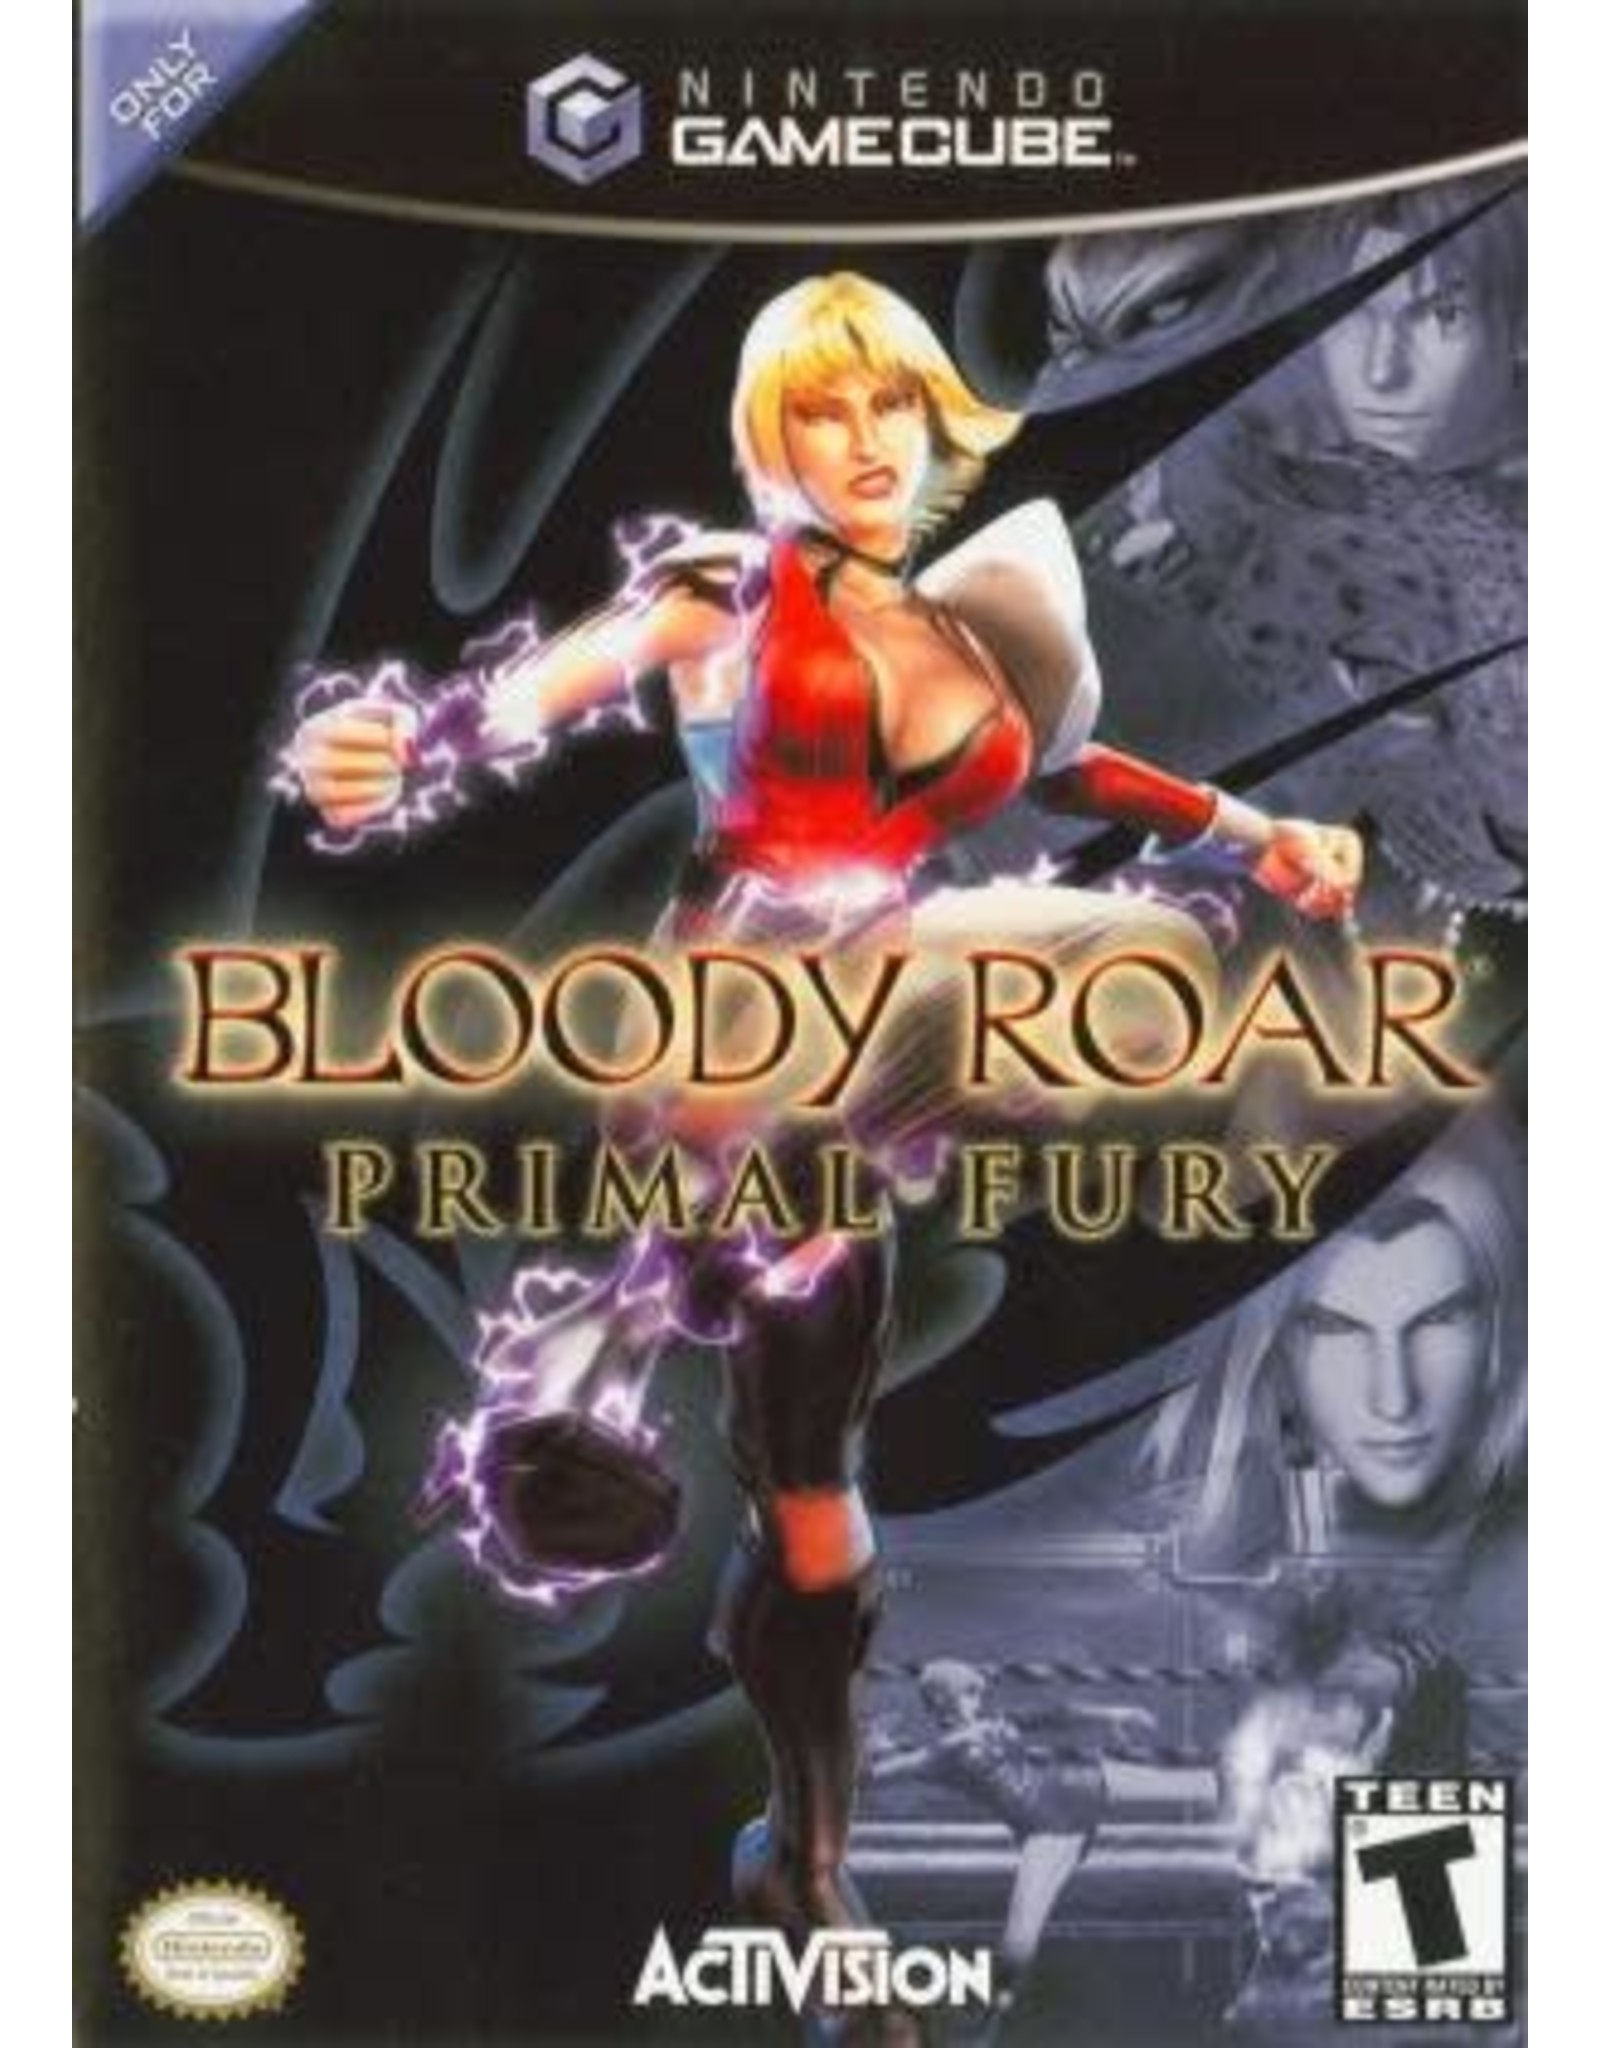 Gamecube Bloody Roar Primal Fury (CIB)